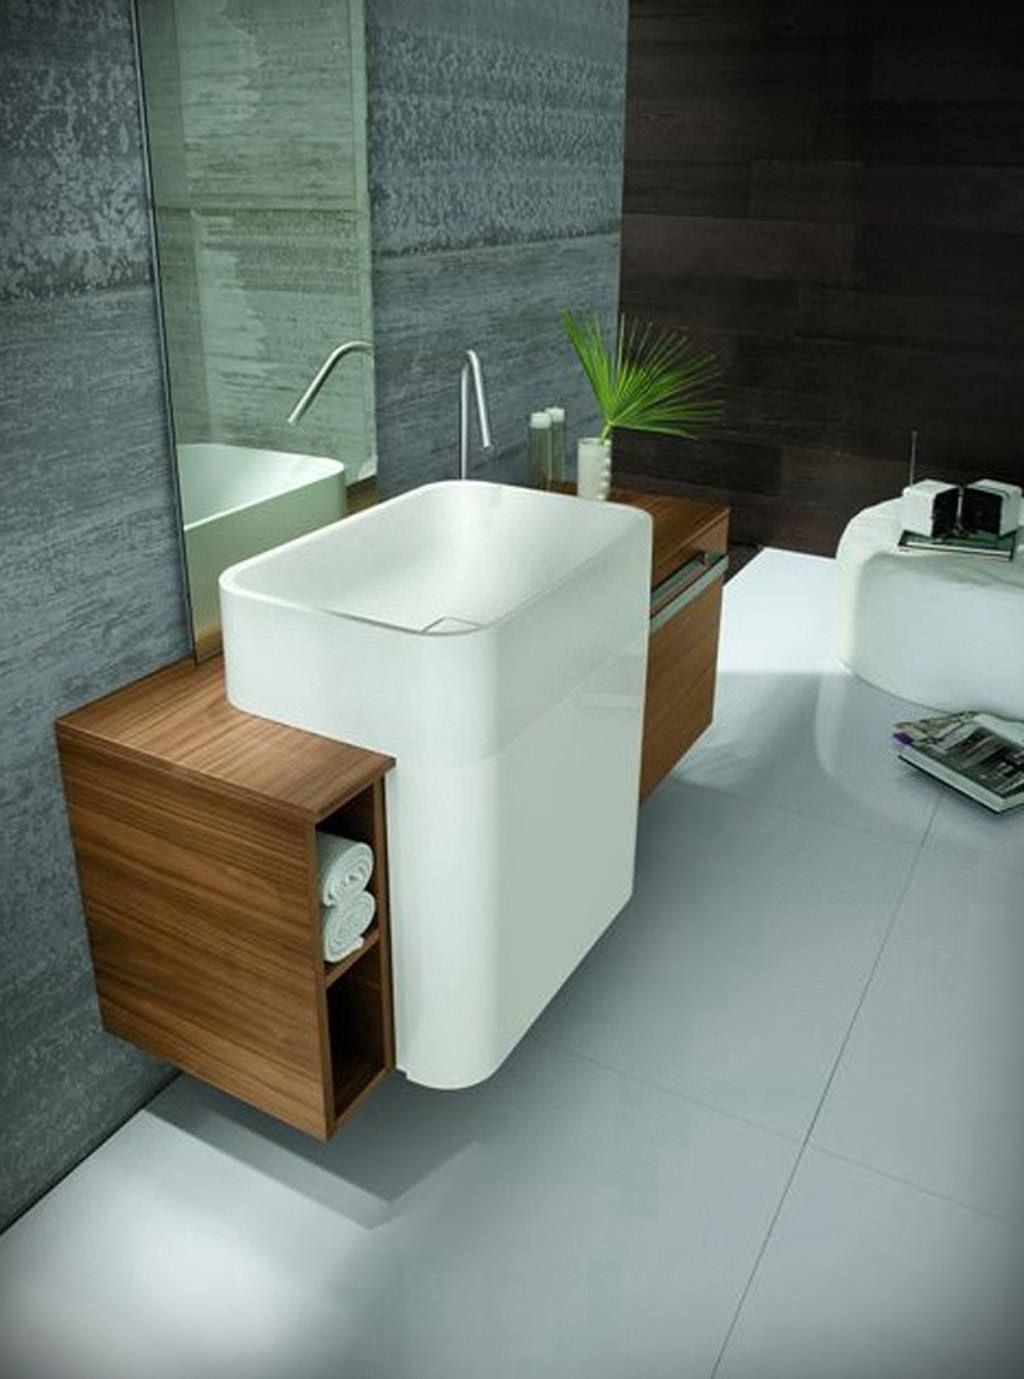 small sink vanity for small bathrooms%0A Small Bathroom Interior Decorating Brilliant Small Bathroom Minimalist With u